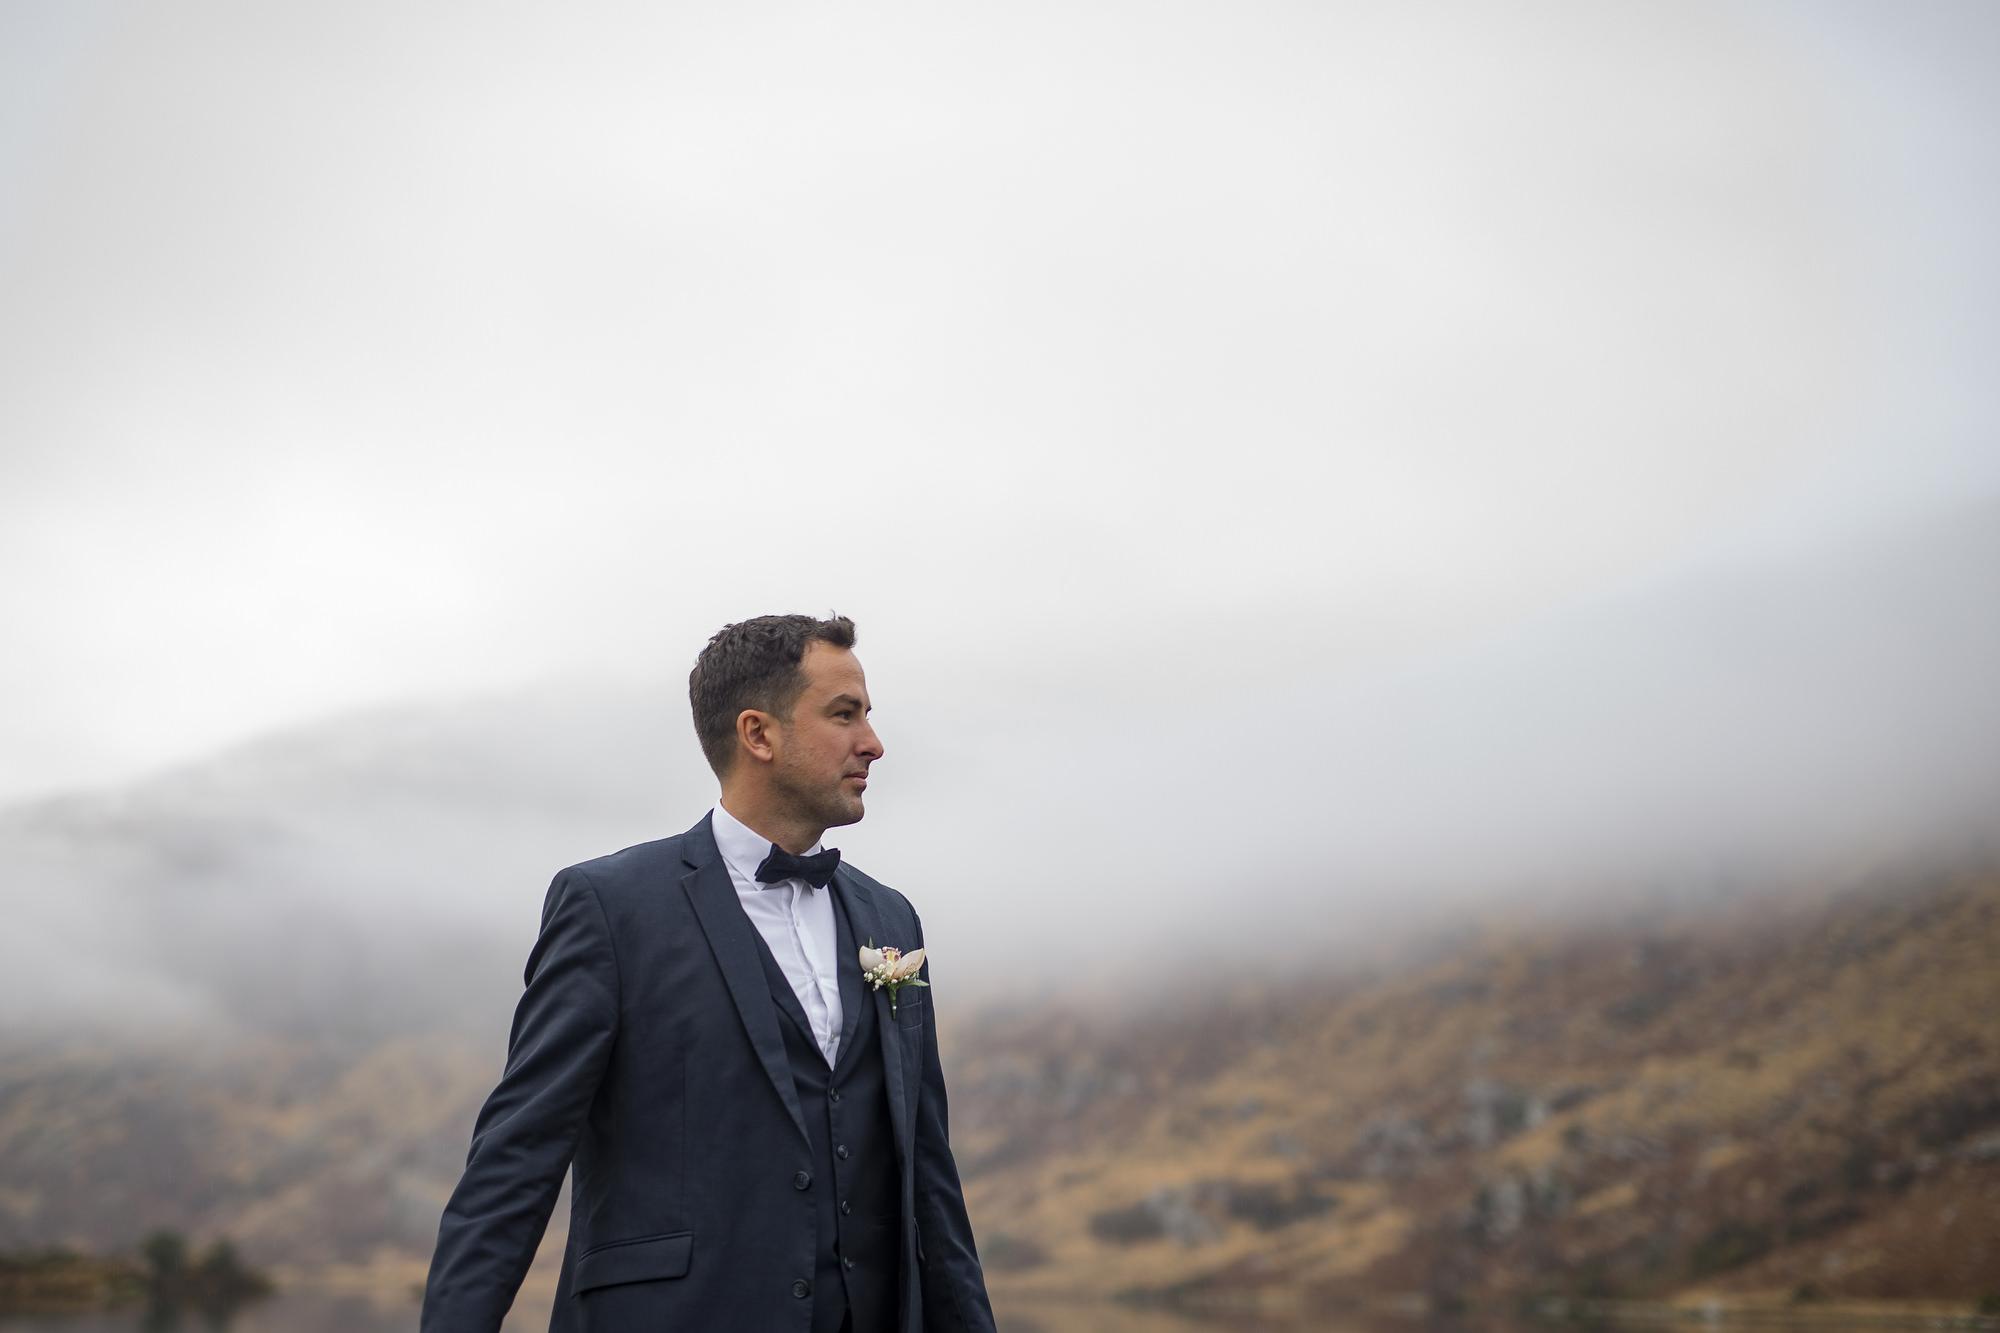 muckross_park_hotel_grougane_barra_wedding_photographer_goldenmoments_025.jpg